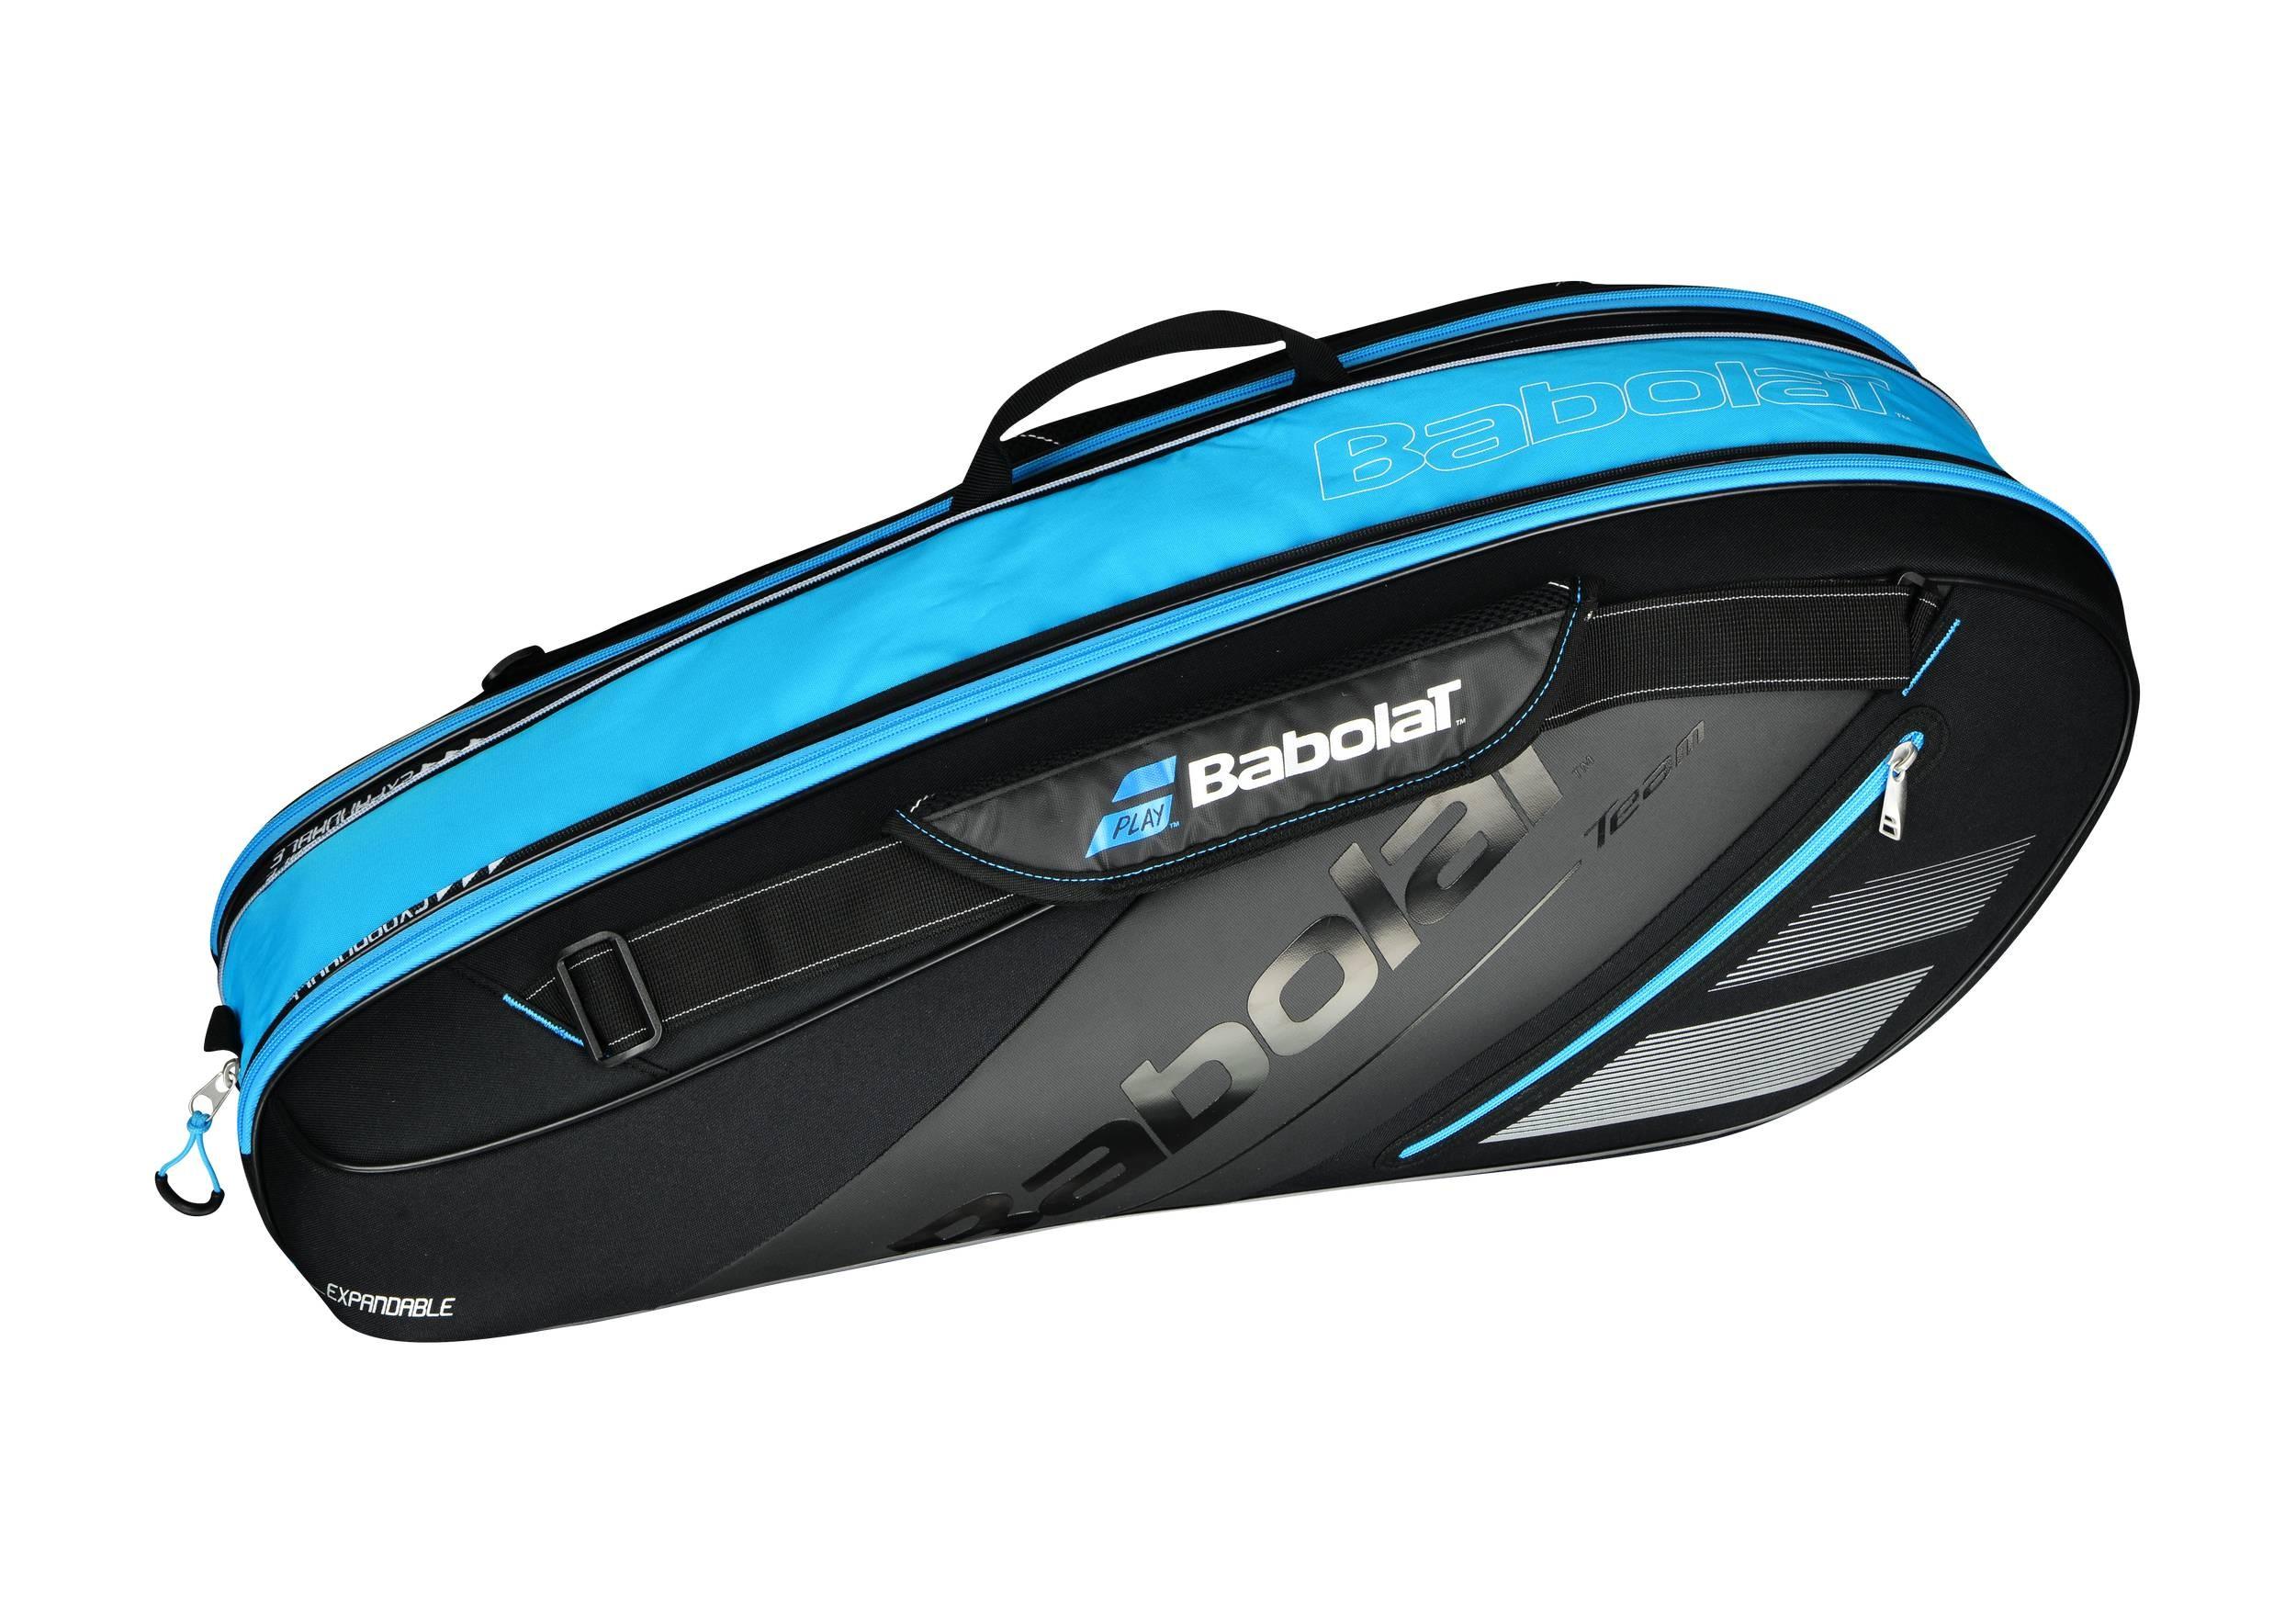 90f05b454ebaa Torba tenisowa Babolat Team x6 Expandable Black Blue 2018